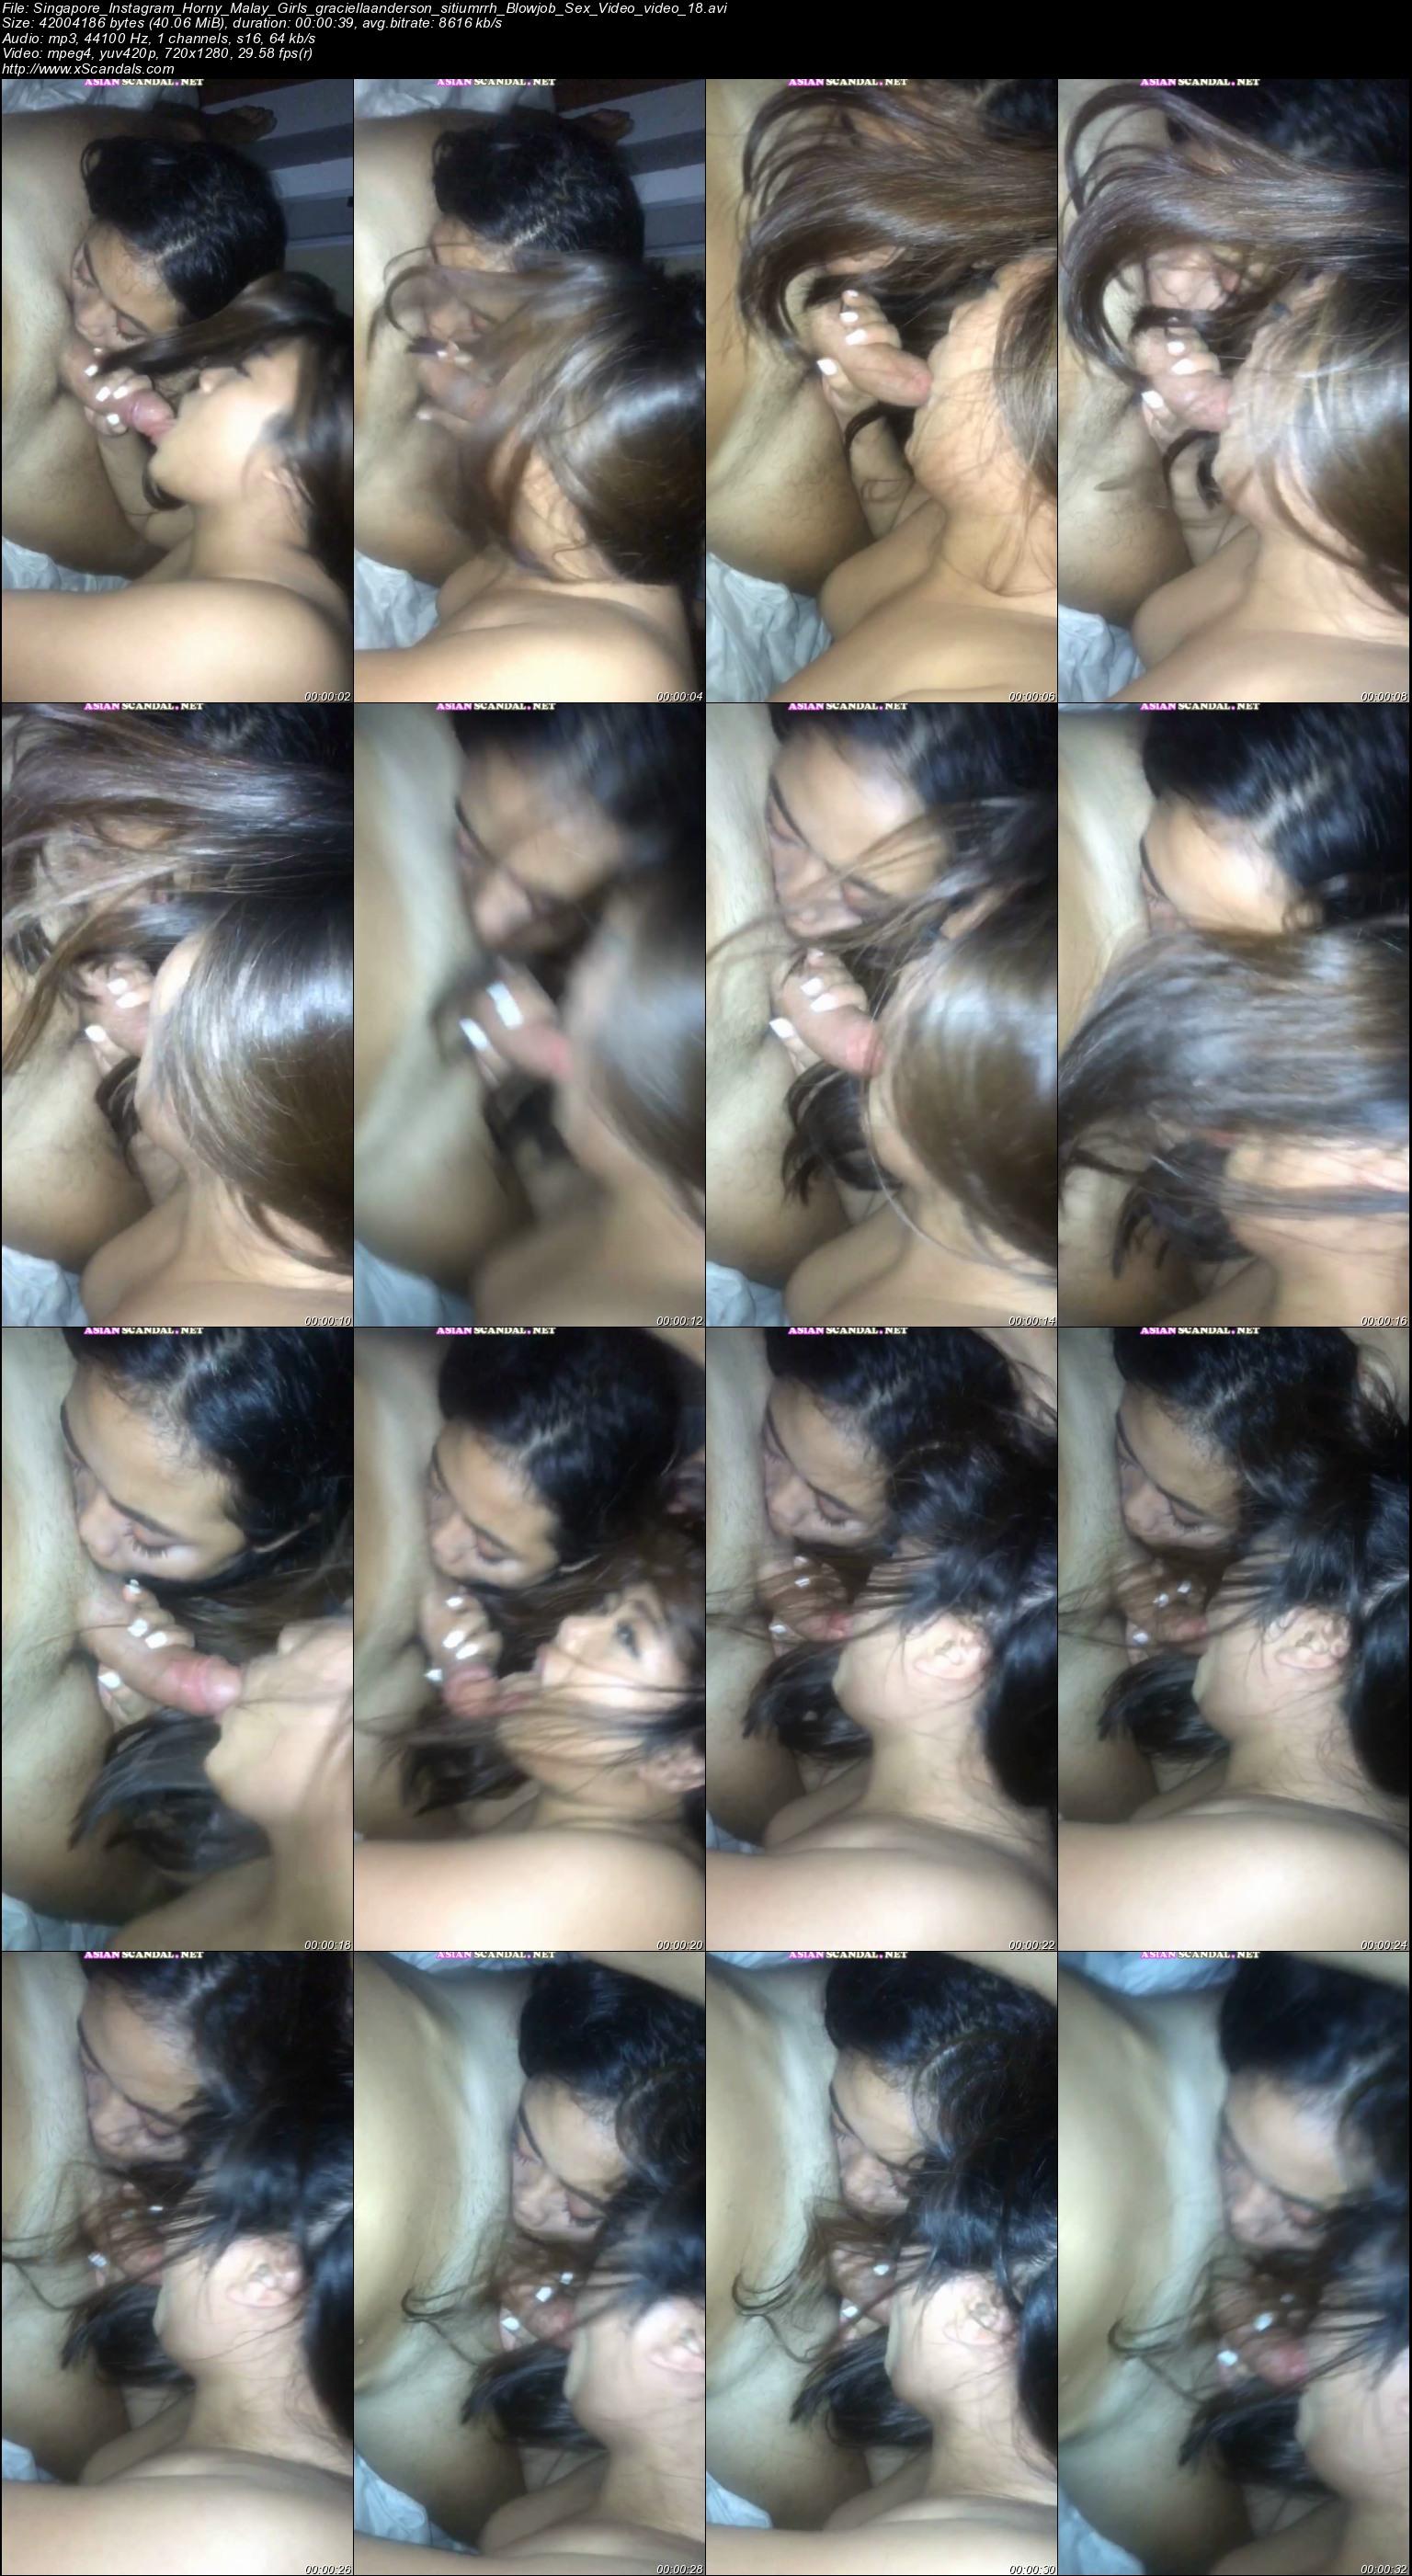 Singapore_Instagram_Horny_Malay_Girls_graciellaanderson_sitiumrrh_Blowjob_Sex_Video_video_18.jpeg